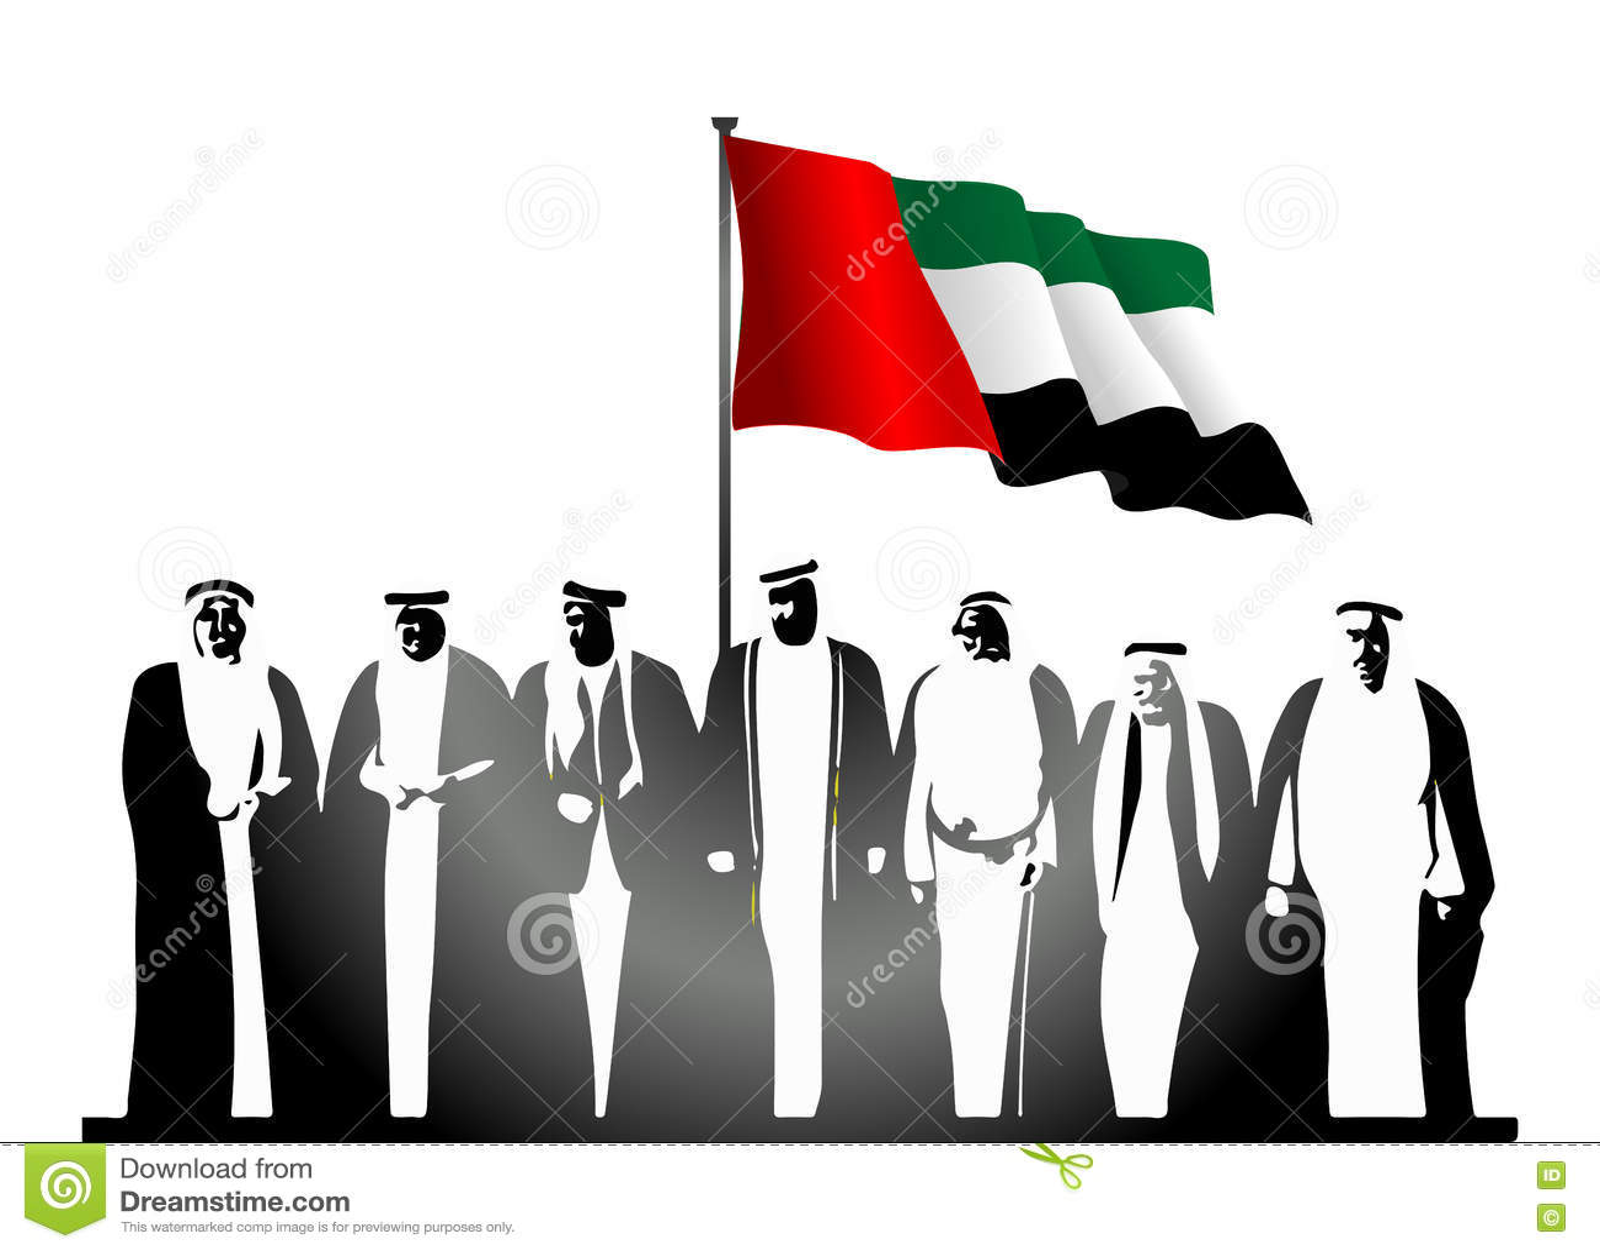 Sharjah stock illustrations 274 sharjah stock illustrations united arab emirates uae national day logo vector illustration royalty free stock photos biocorpaavc Images